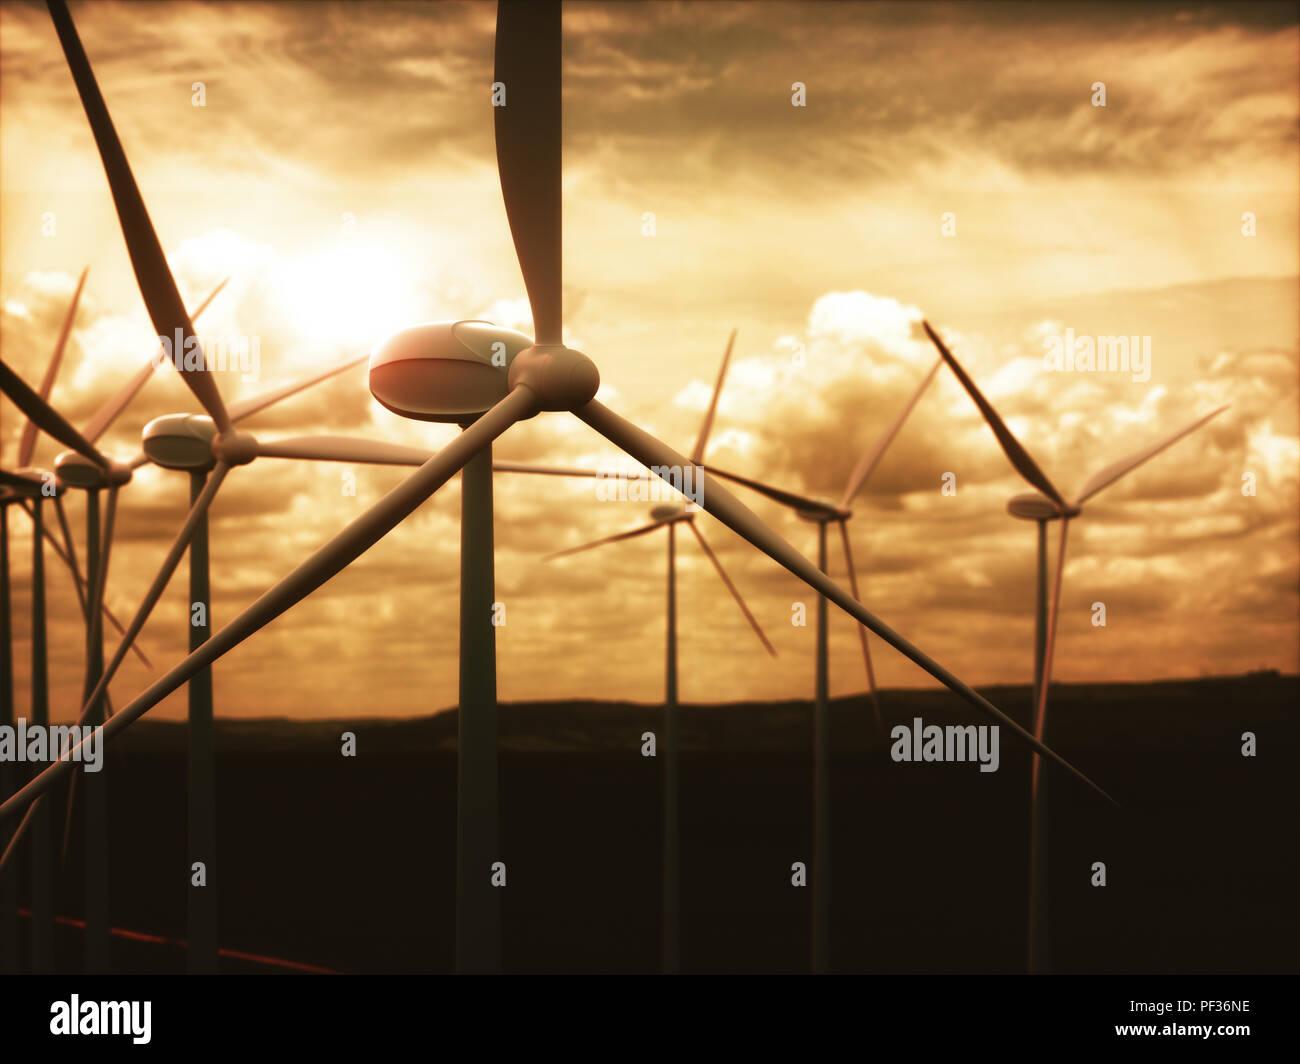 Windparks in Wind Power Generation. Mechanische Energie in elektrische Energie umgewandelt. Stockbild